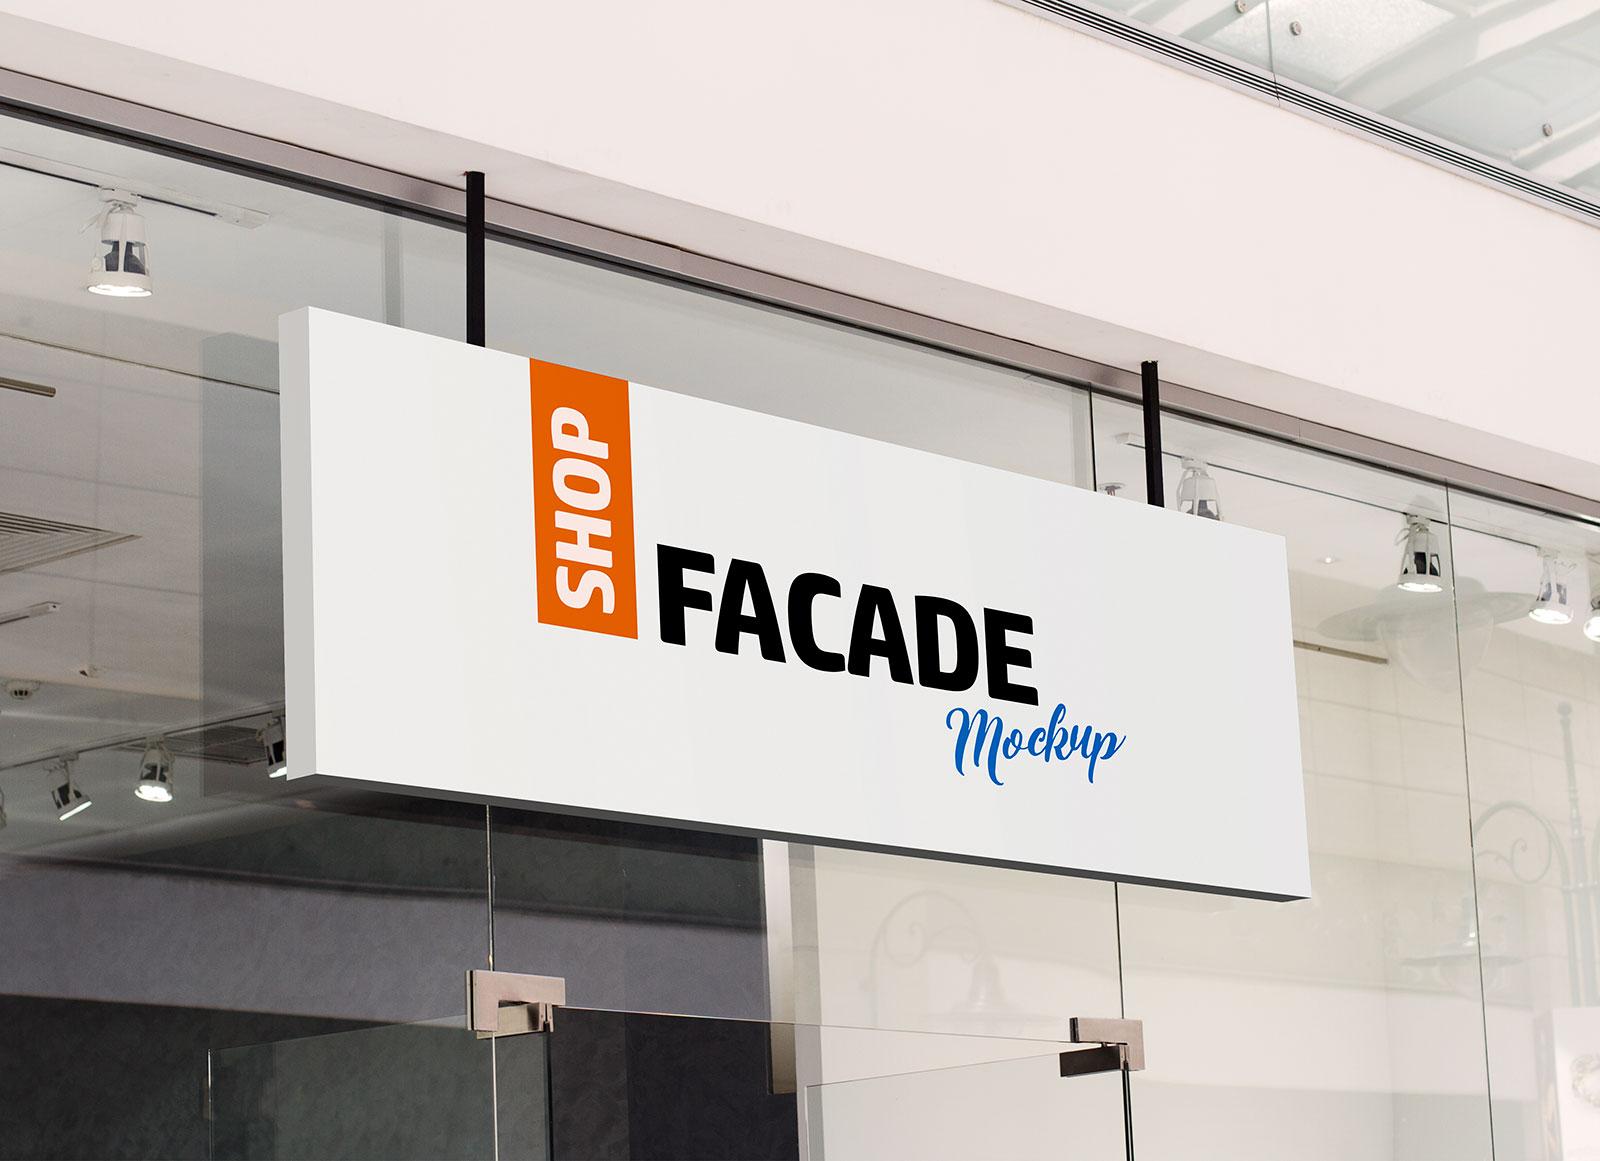 Free Restaurant Shop Facade Logo Mockup PSD